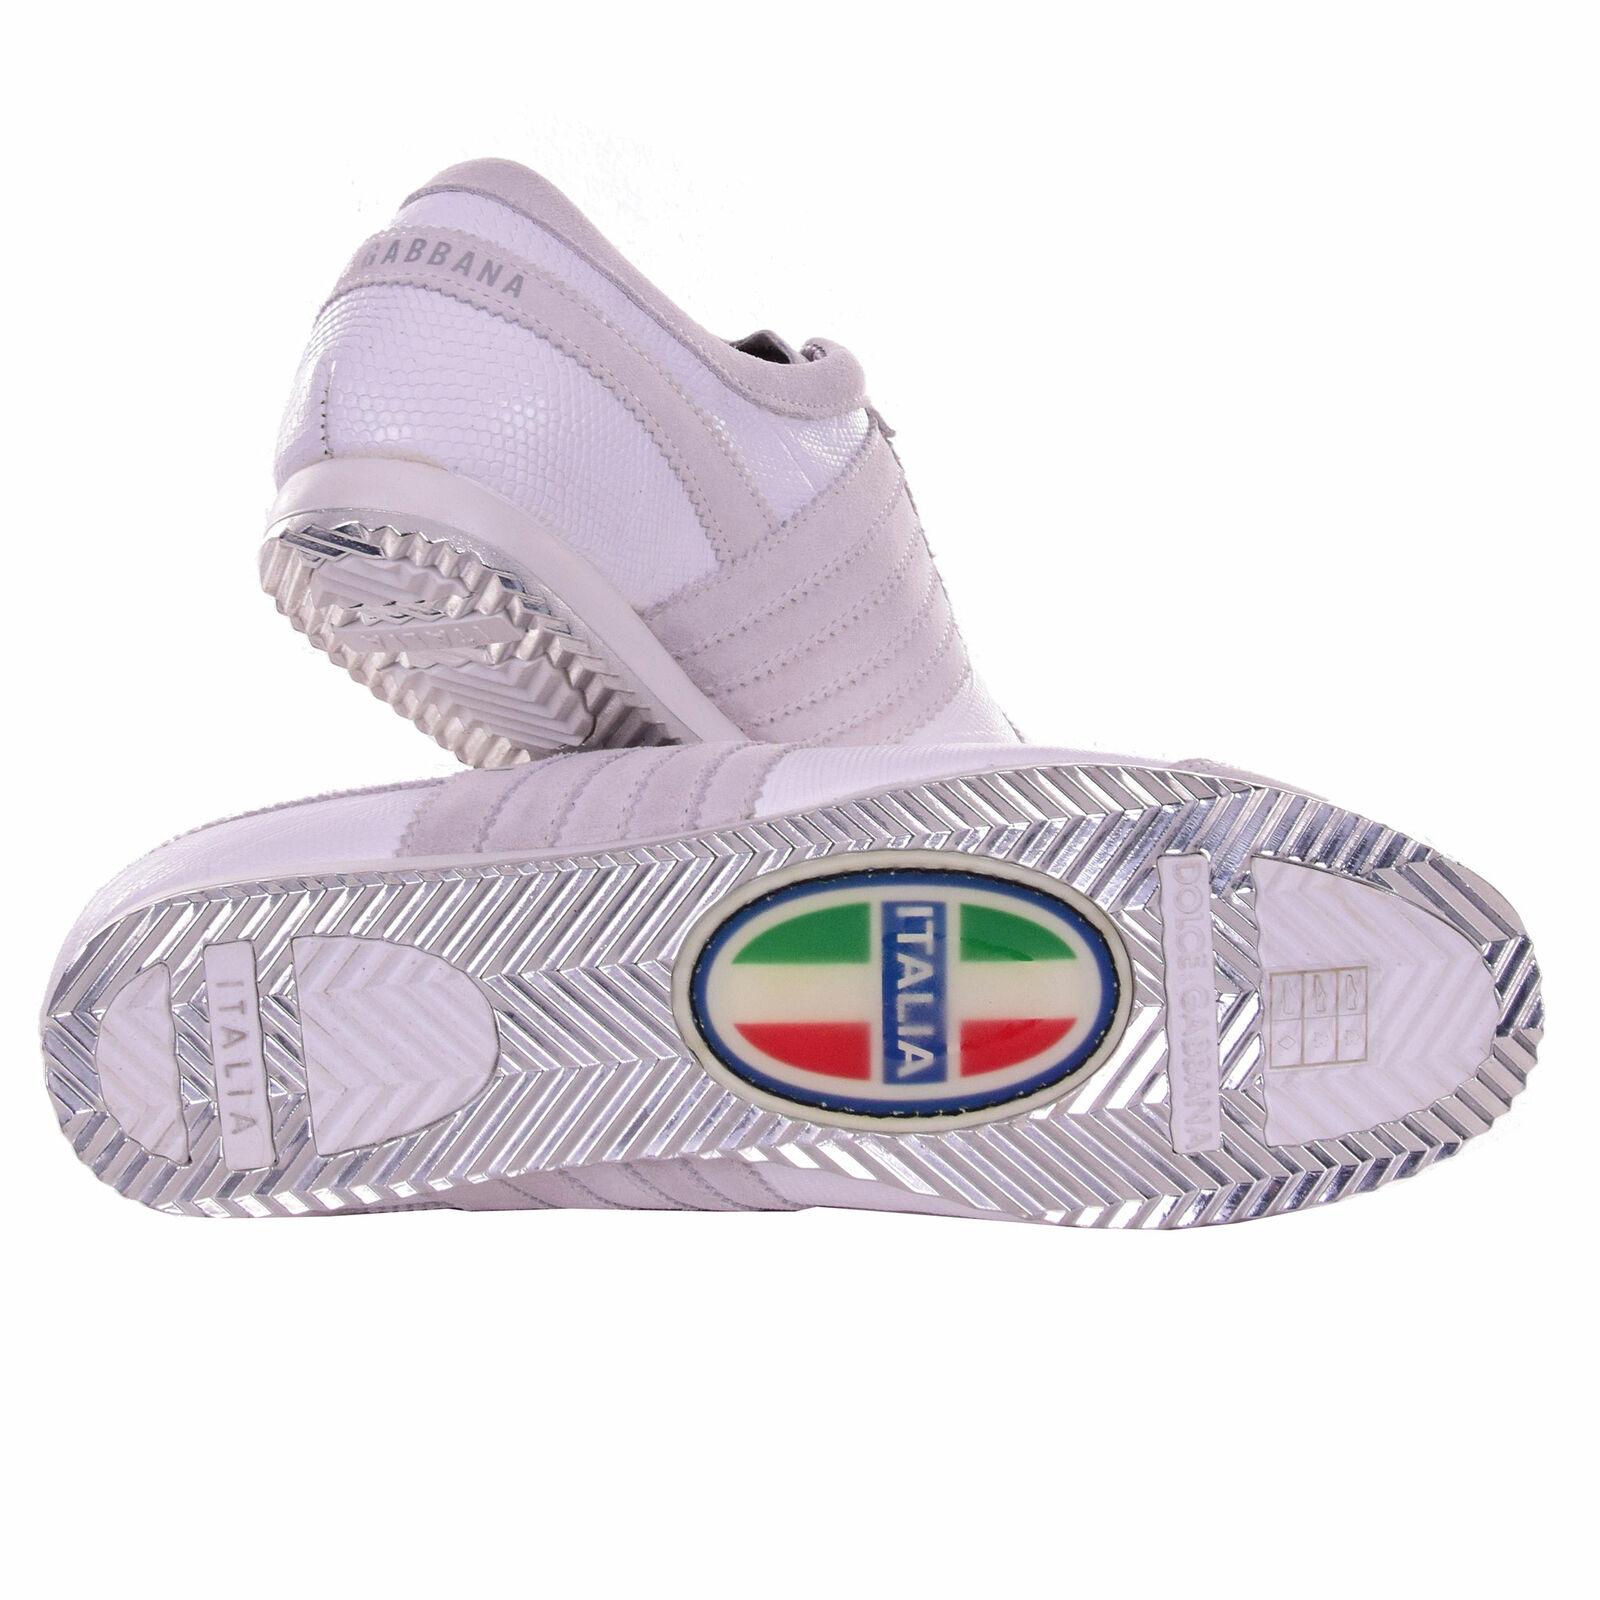 DOLCE /& GABBANA Rare Lizard Reptile Suede Sneakers Shoes ITALIA Logo White 08123